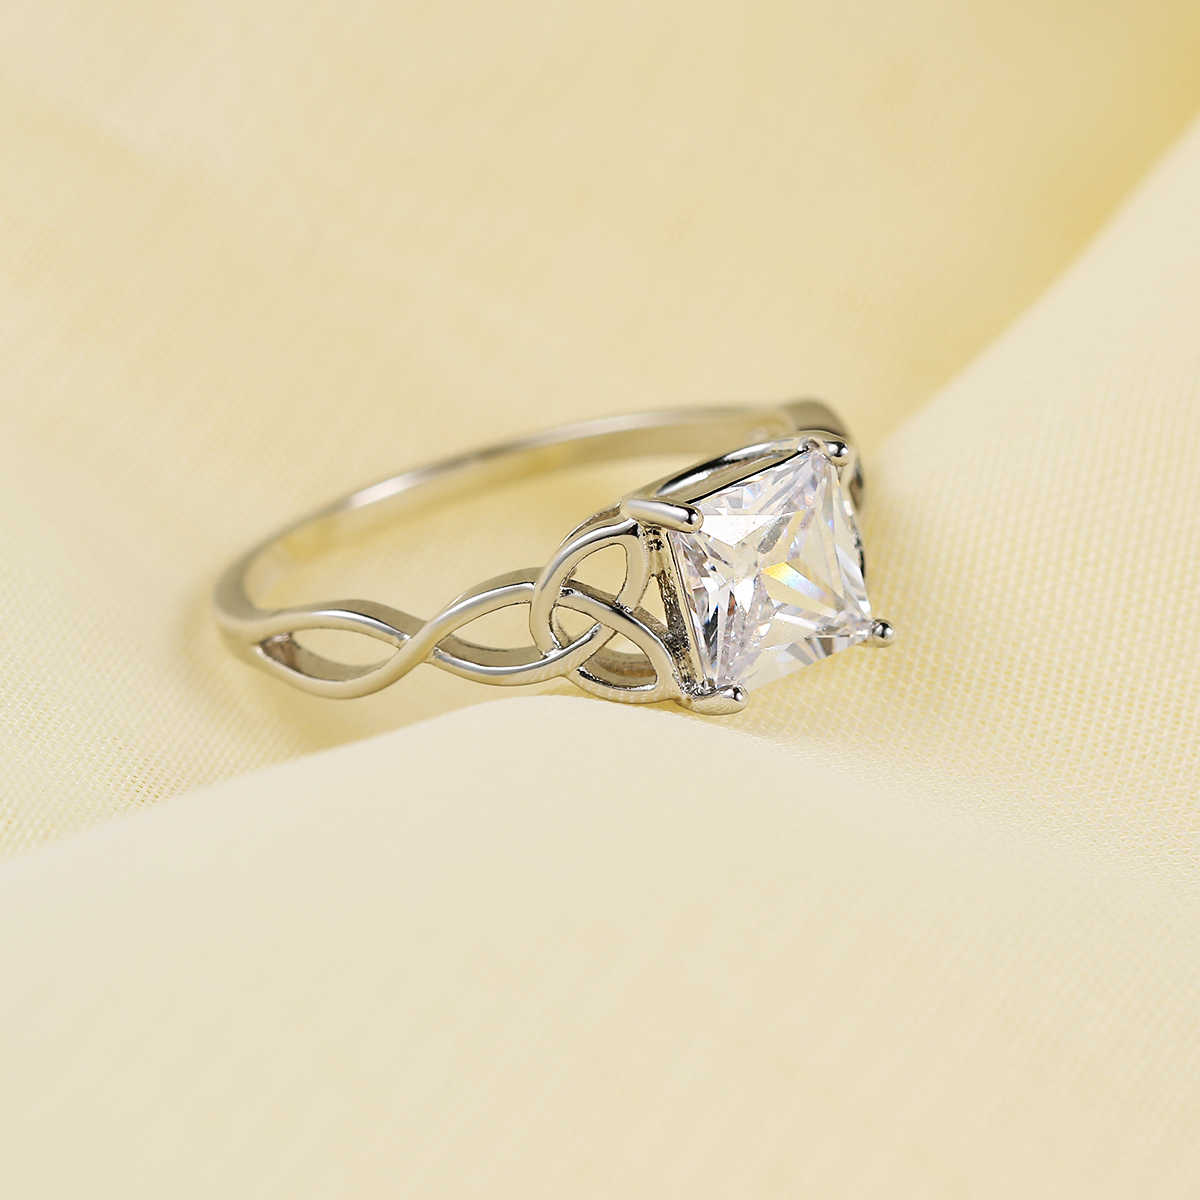 ZHOUYANG แหวนอารมณ์บางไขลานหมั้นแหวน Silver Silver Cubic Zirconia แฟชั่นเครื่องประดับของขวัญ DZR018